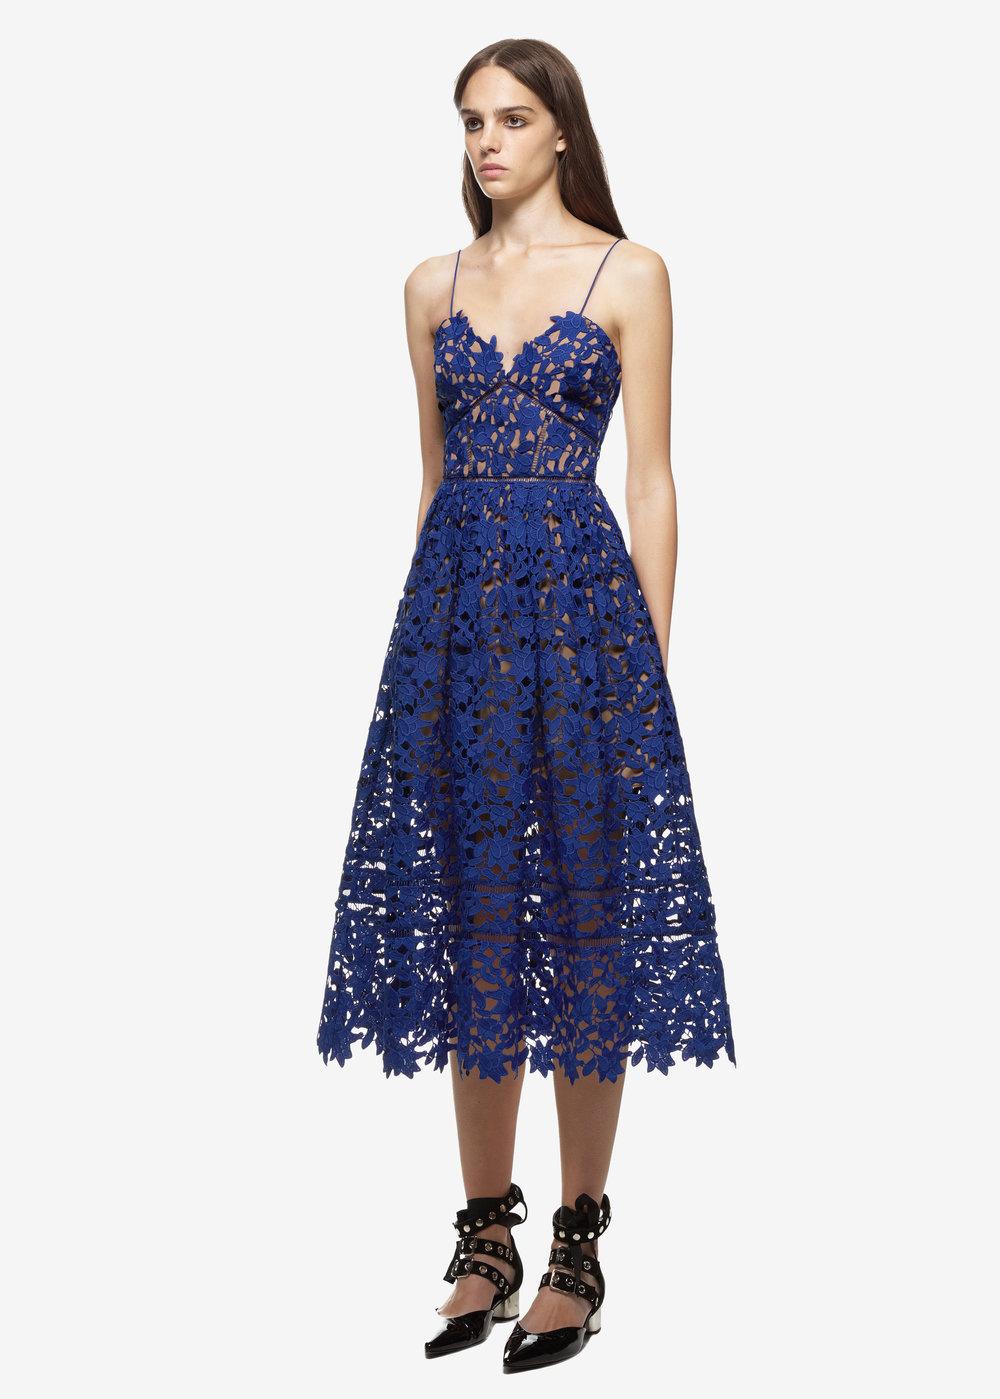 Azalea Dress $398